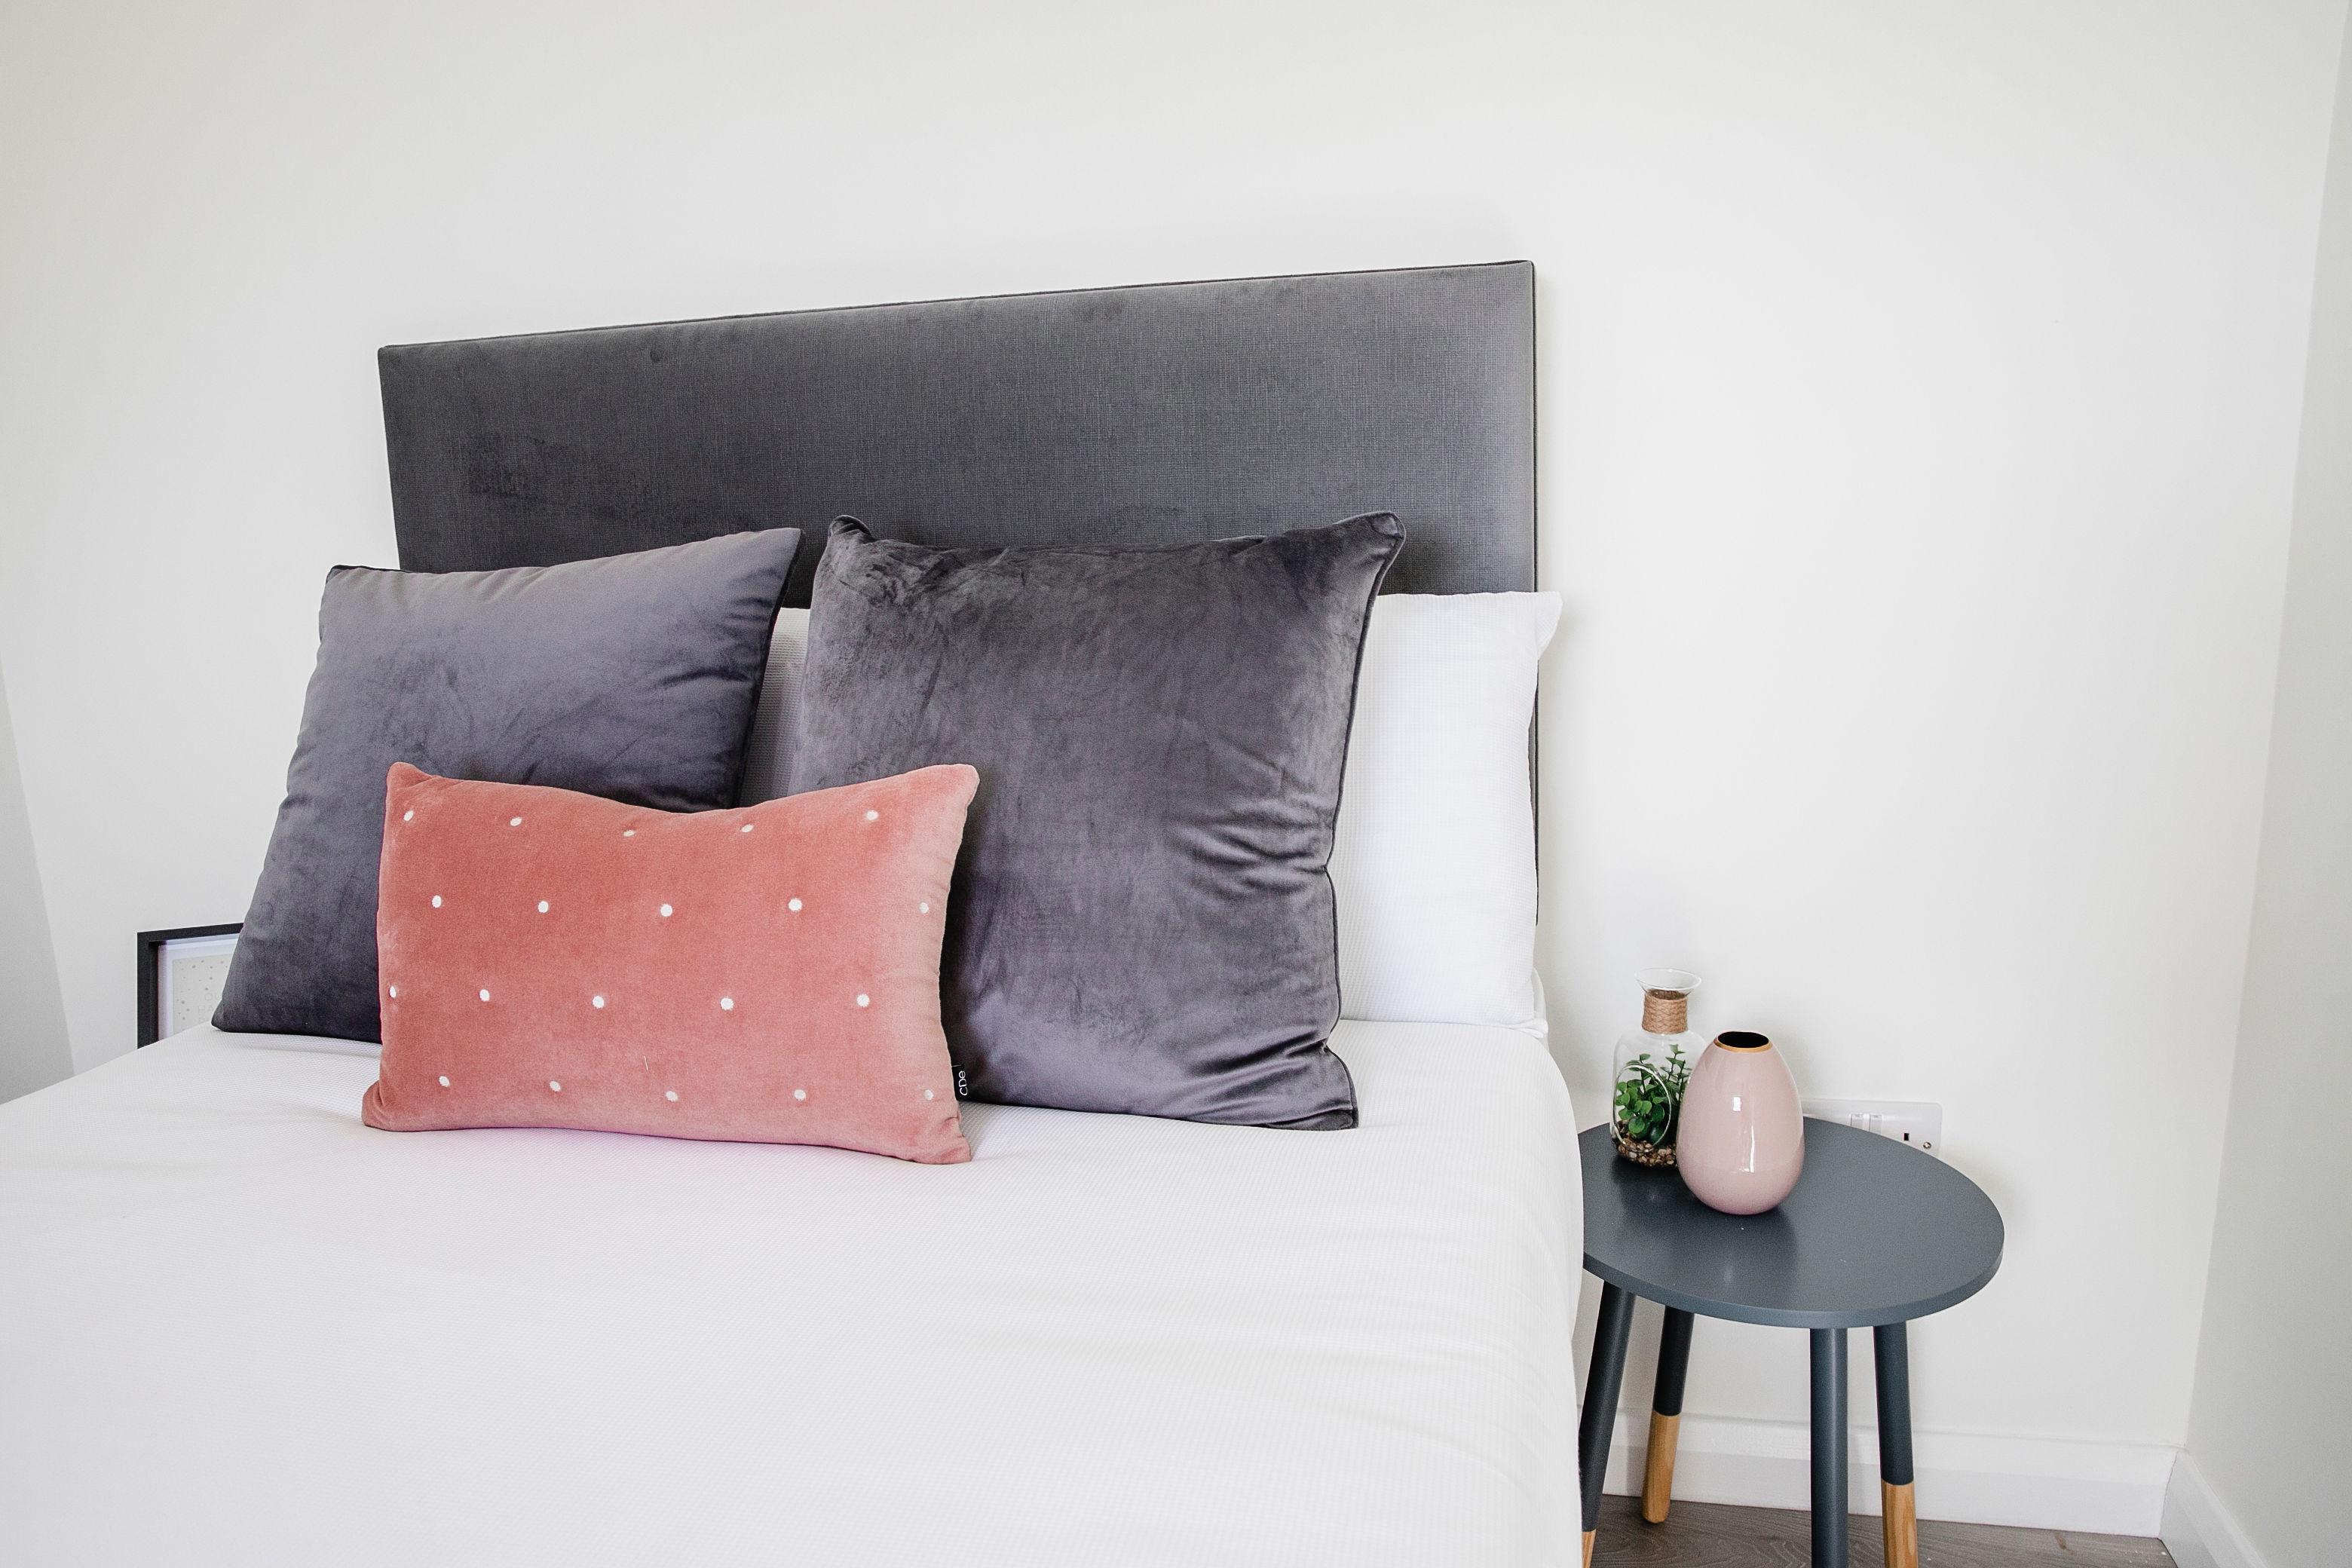 Stylish modern modular interiors